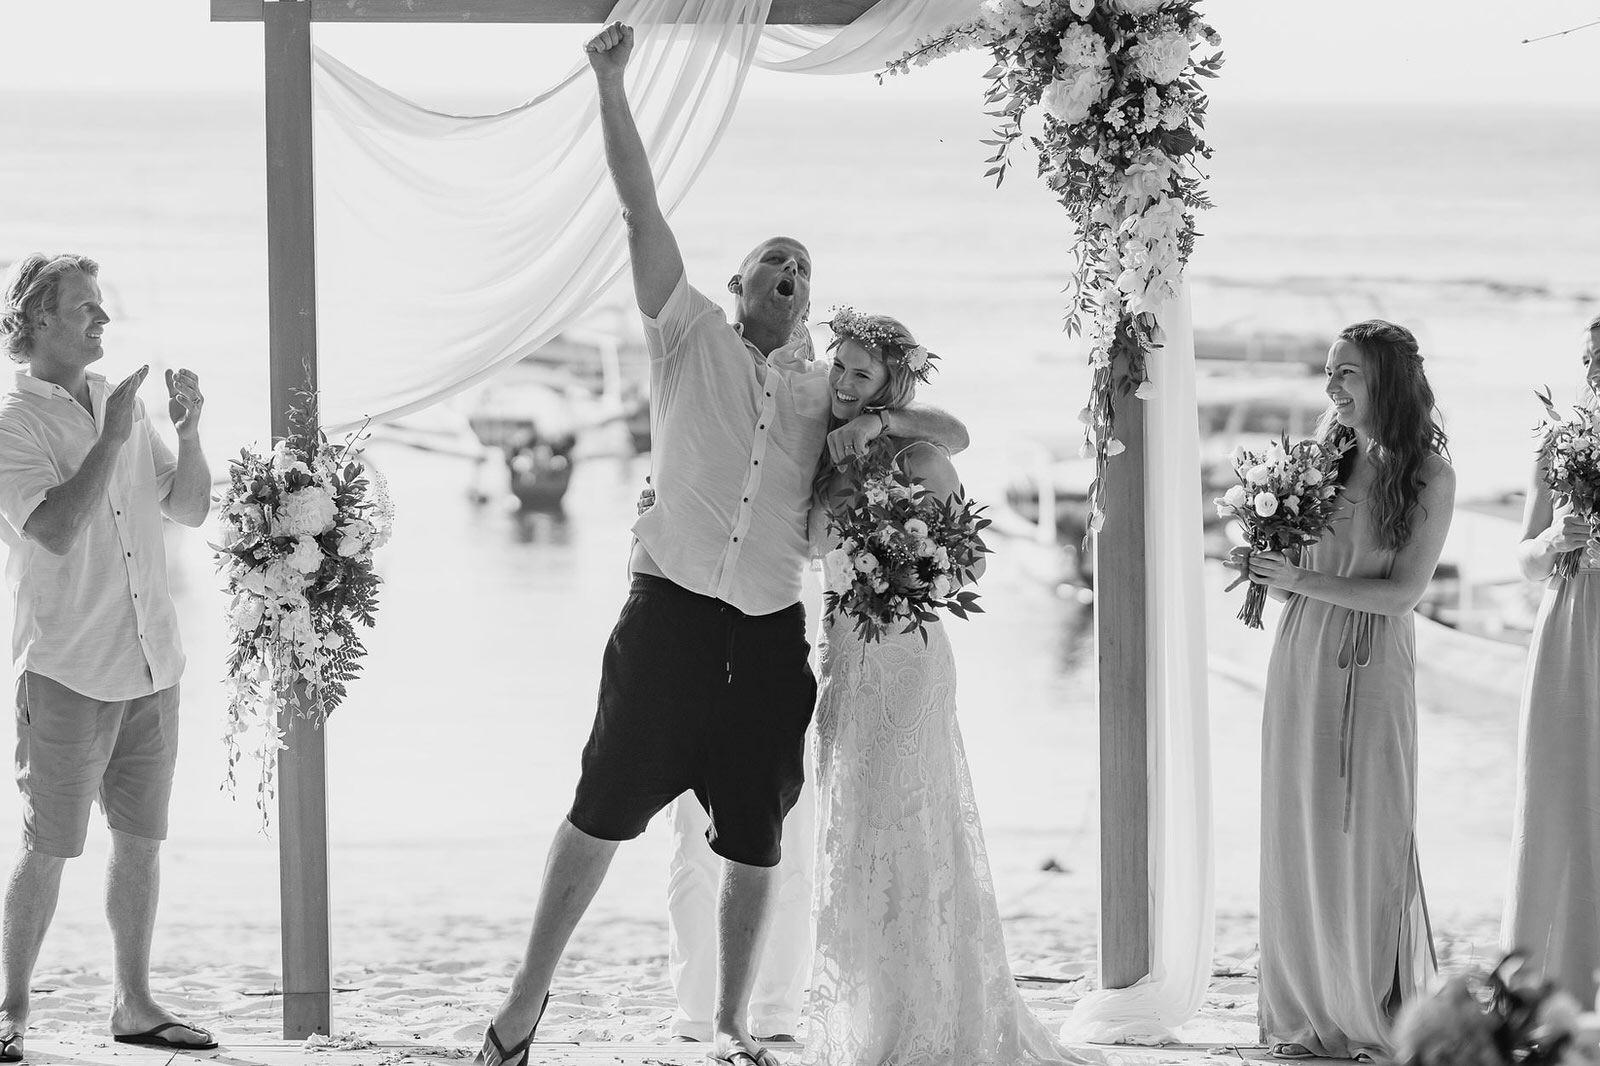 newfound-hai-tide-nusa-lembongan-bali-wedding-photographers-121